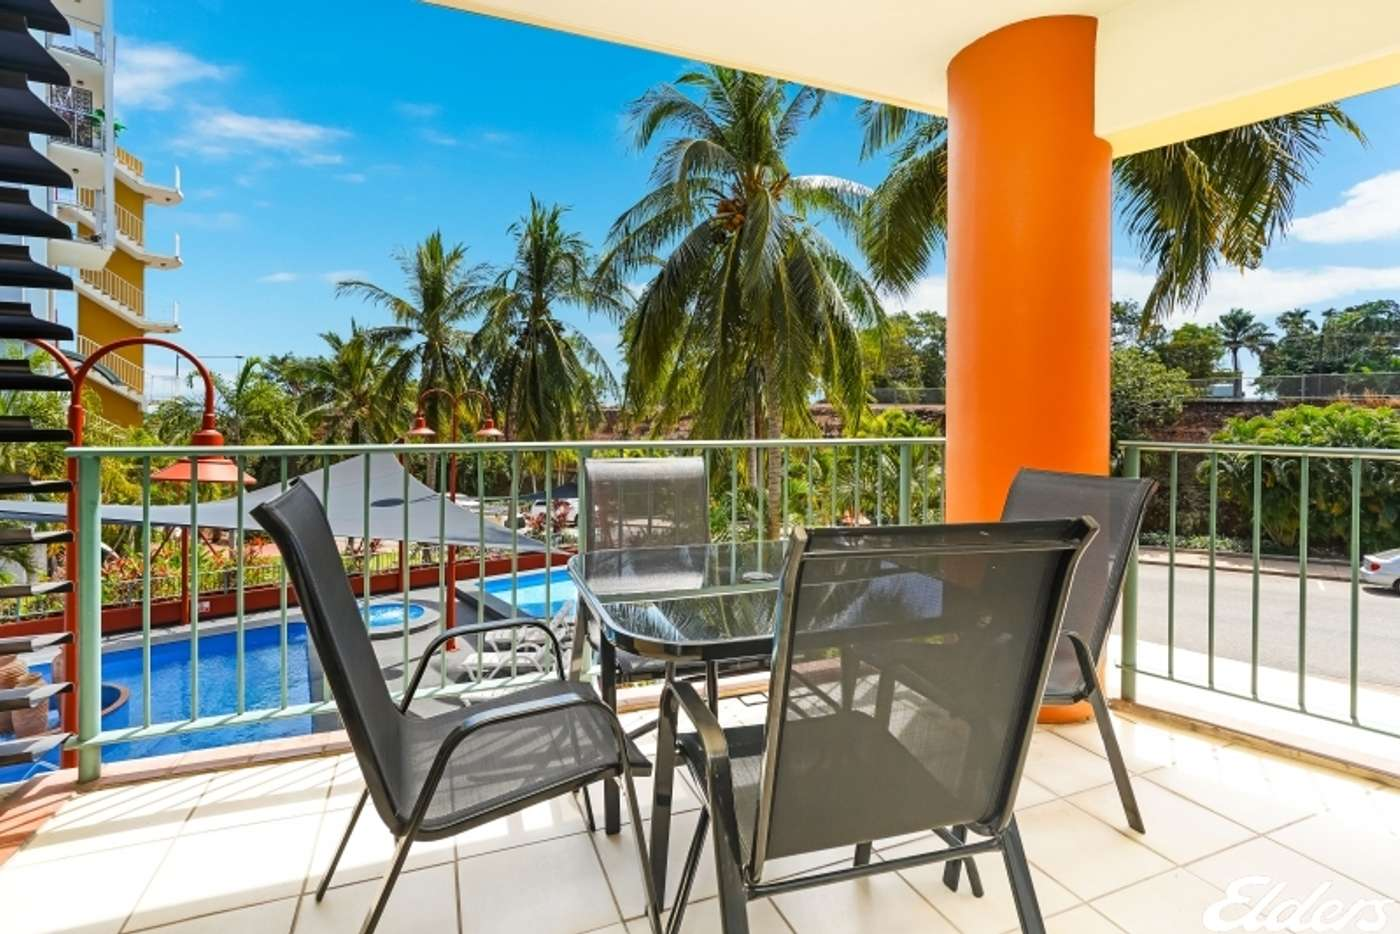 Main view of Homely unit listing, 9/26 Marina Boulevard, Larrakeyah NT 820